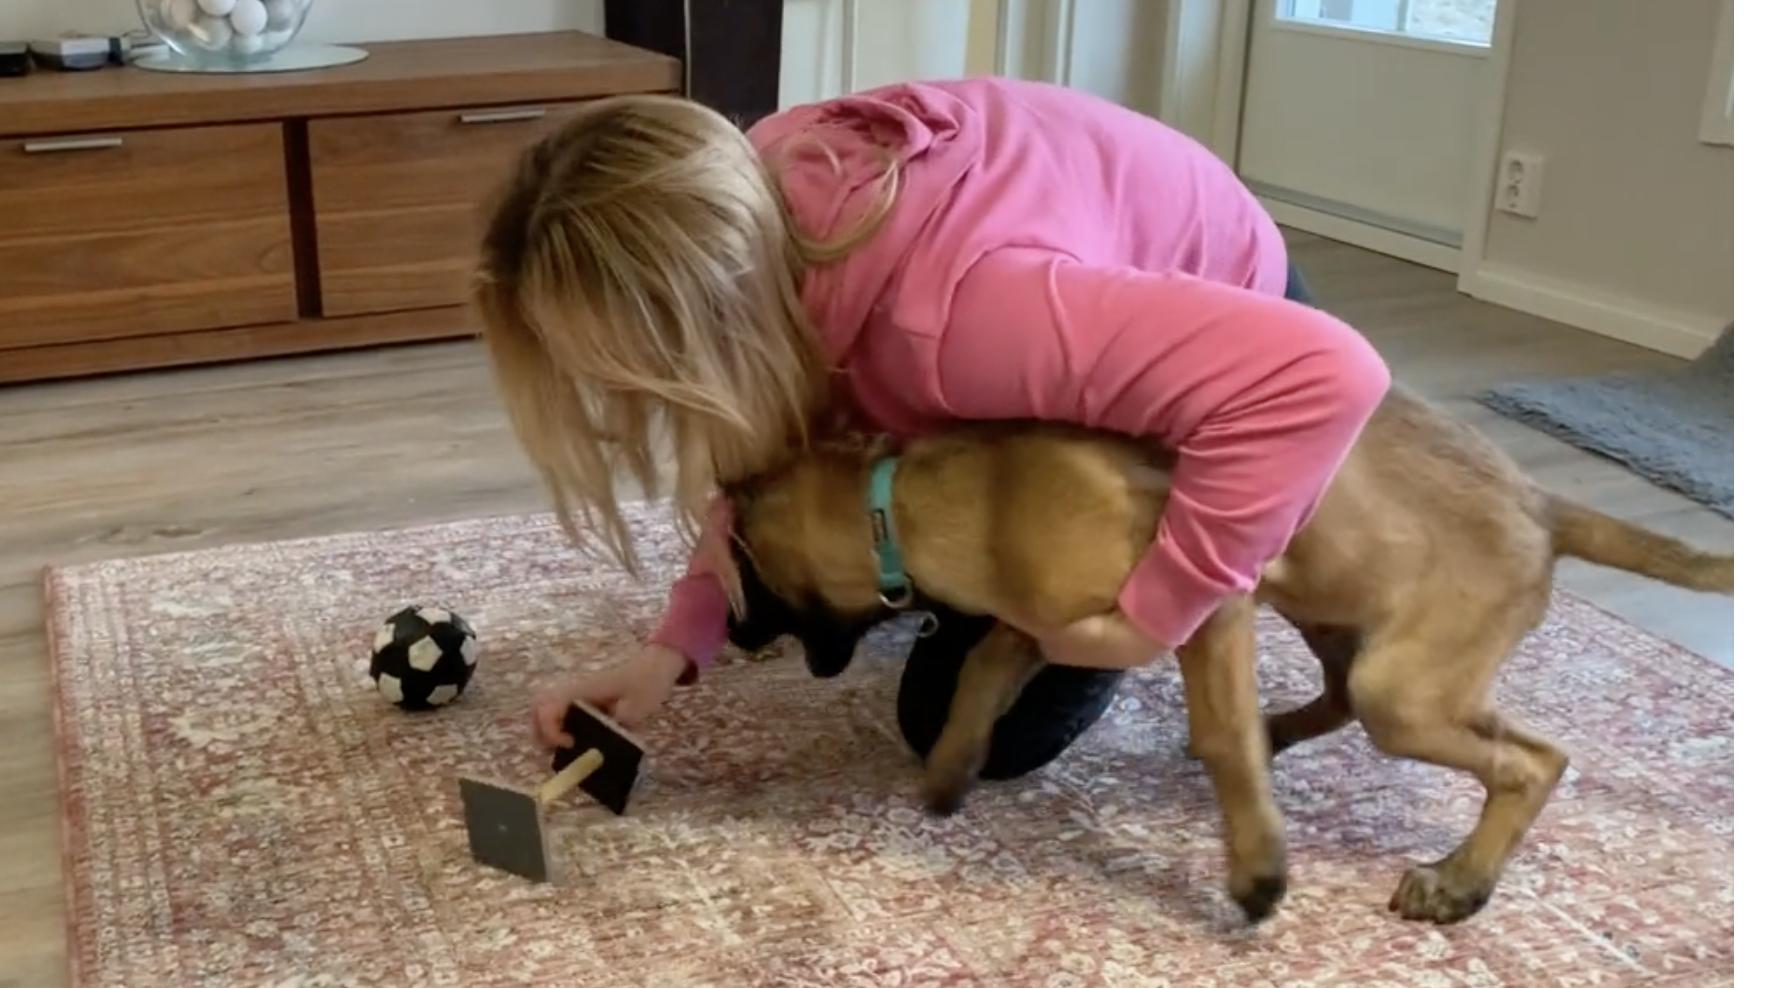 How to teach a fast retrieve to sport dogs